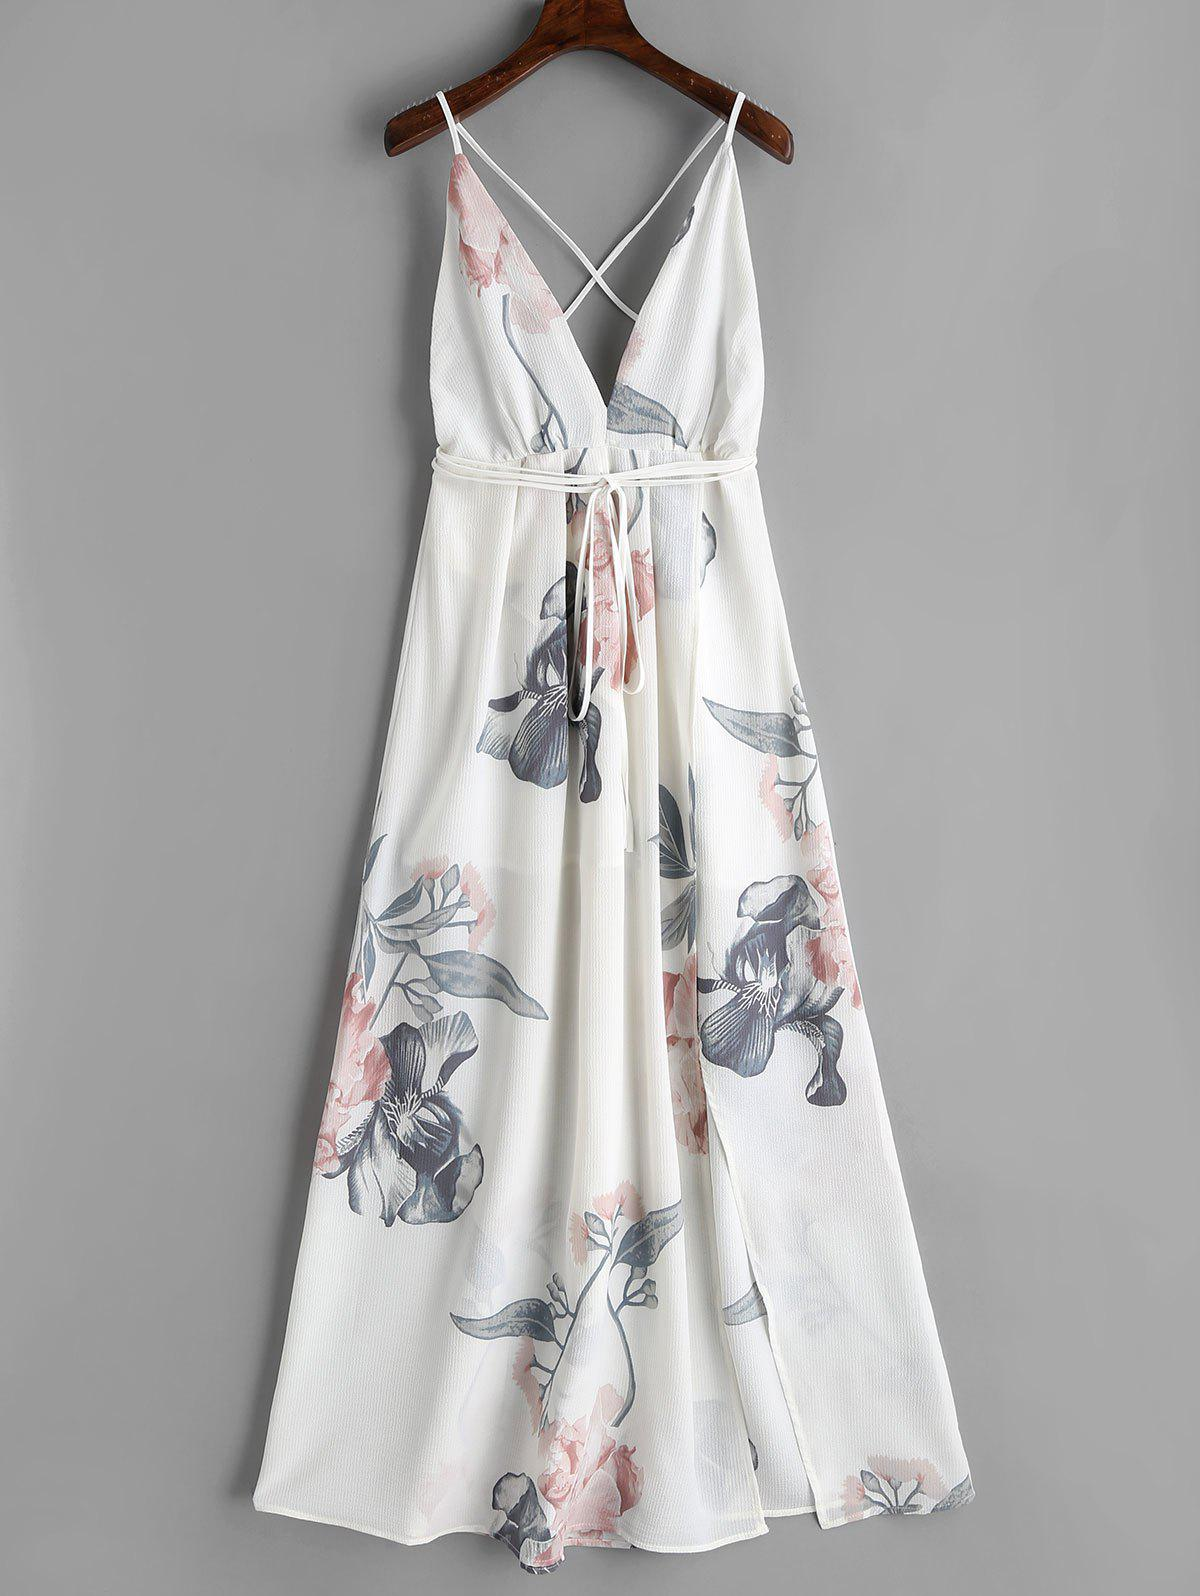 Floral Criss Cross Back Slit Maxi Dress 252502608